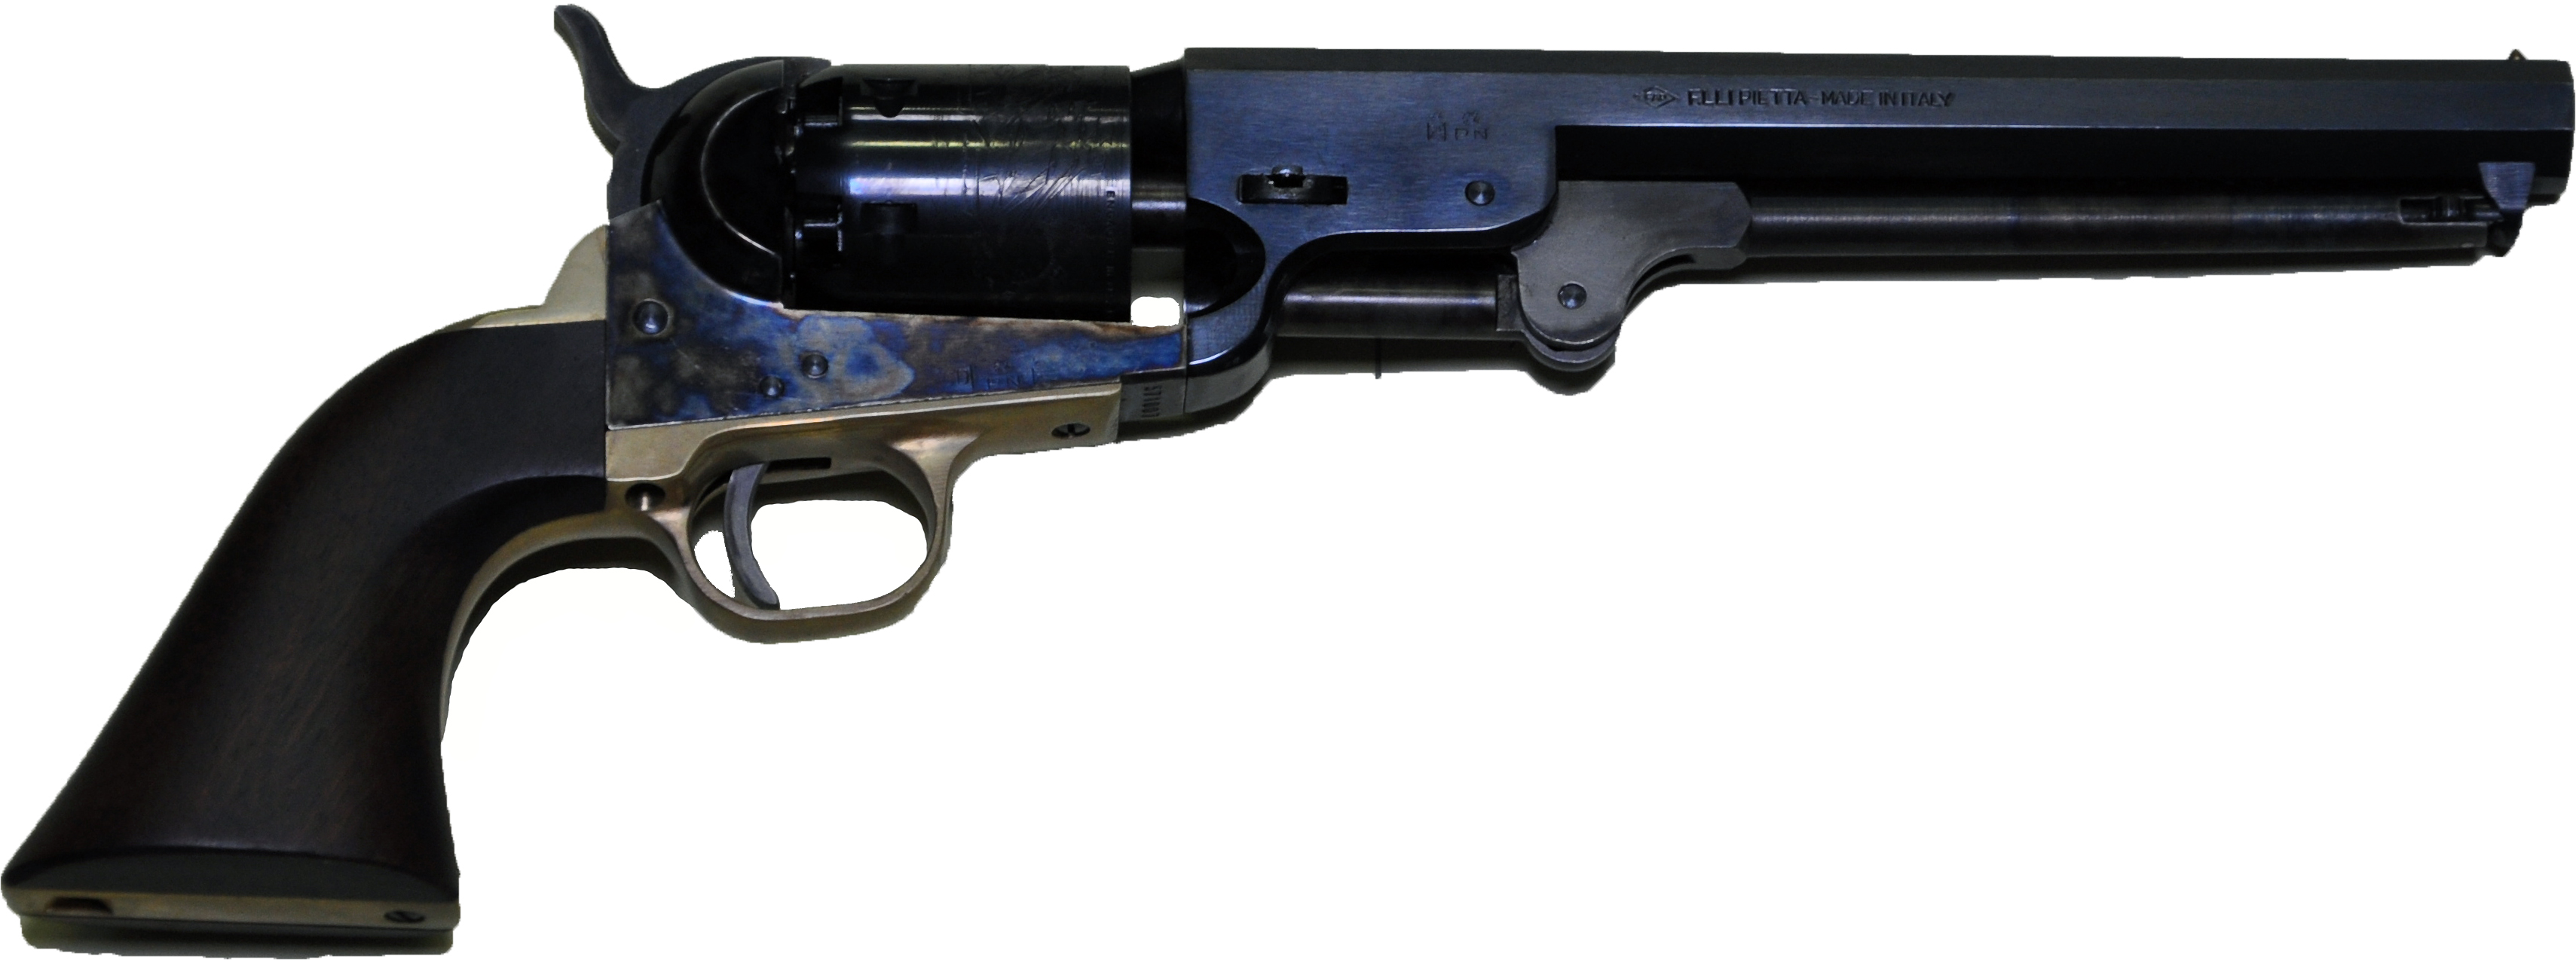 Colt Python CO2 Revolver